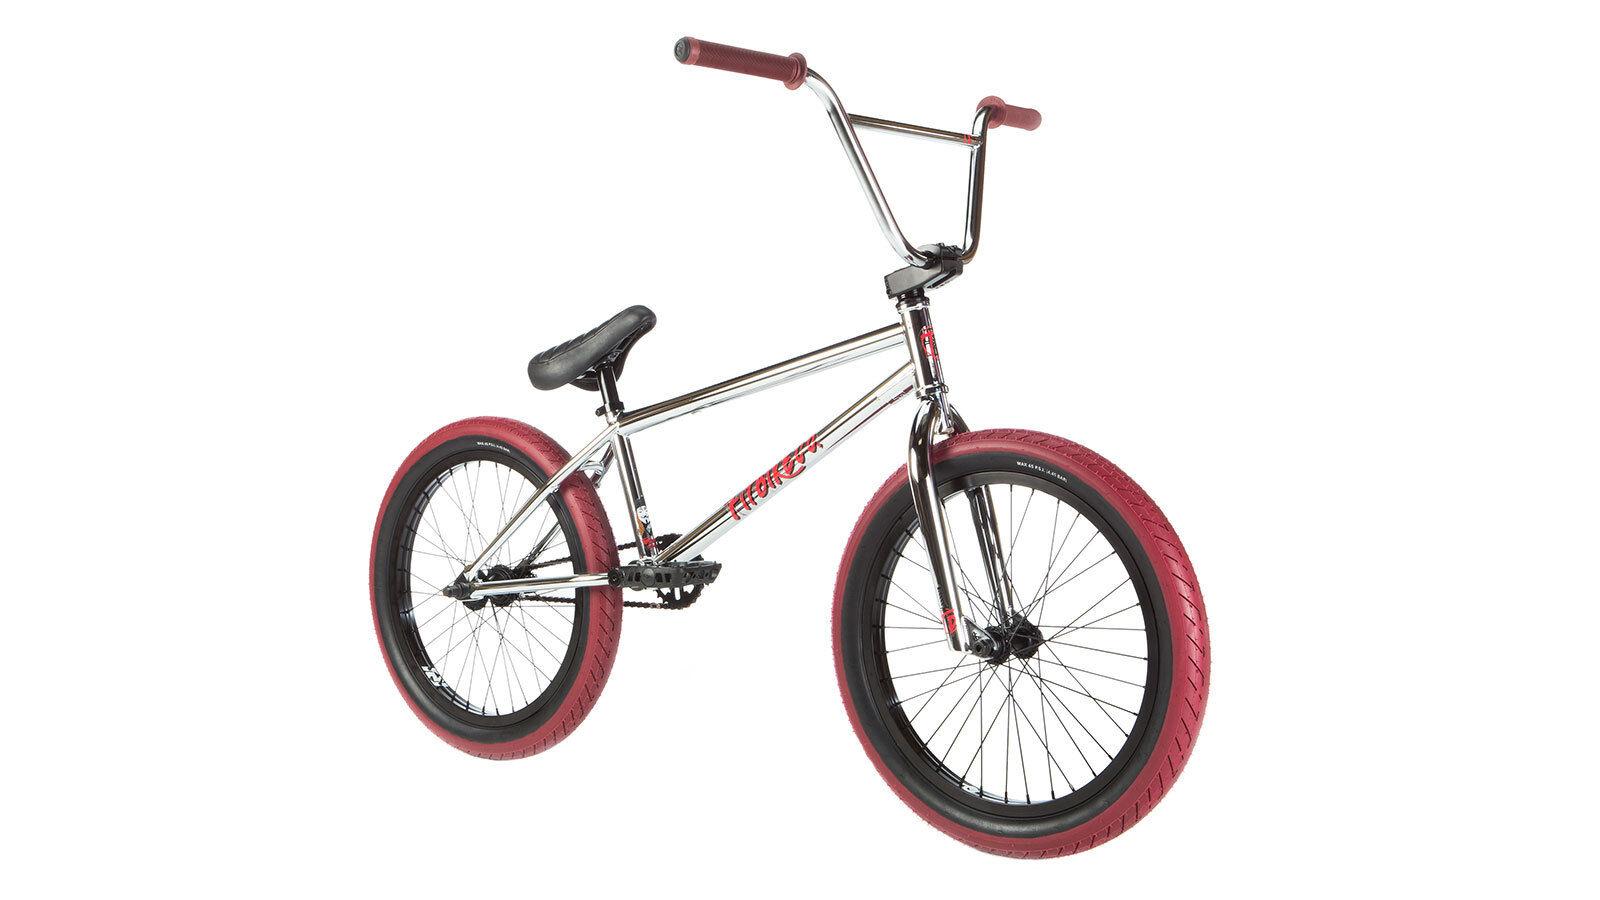 2019 FIT DUGAN CHROME BMX BIKE 20.75  S&M SE KINK HARO GT+FREE SHIP+ FIT HAT NEW